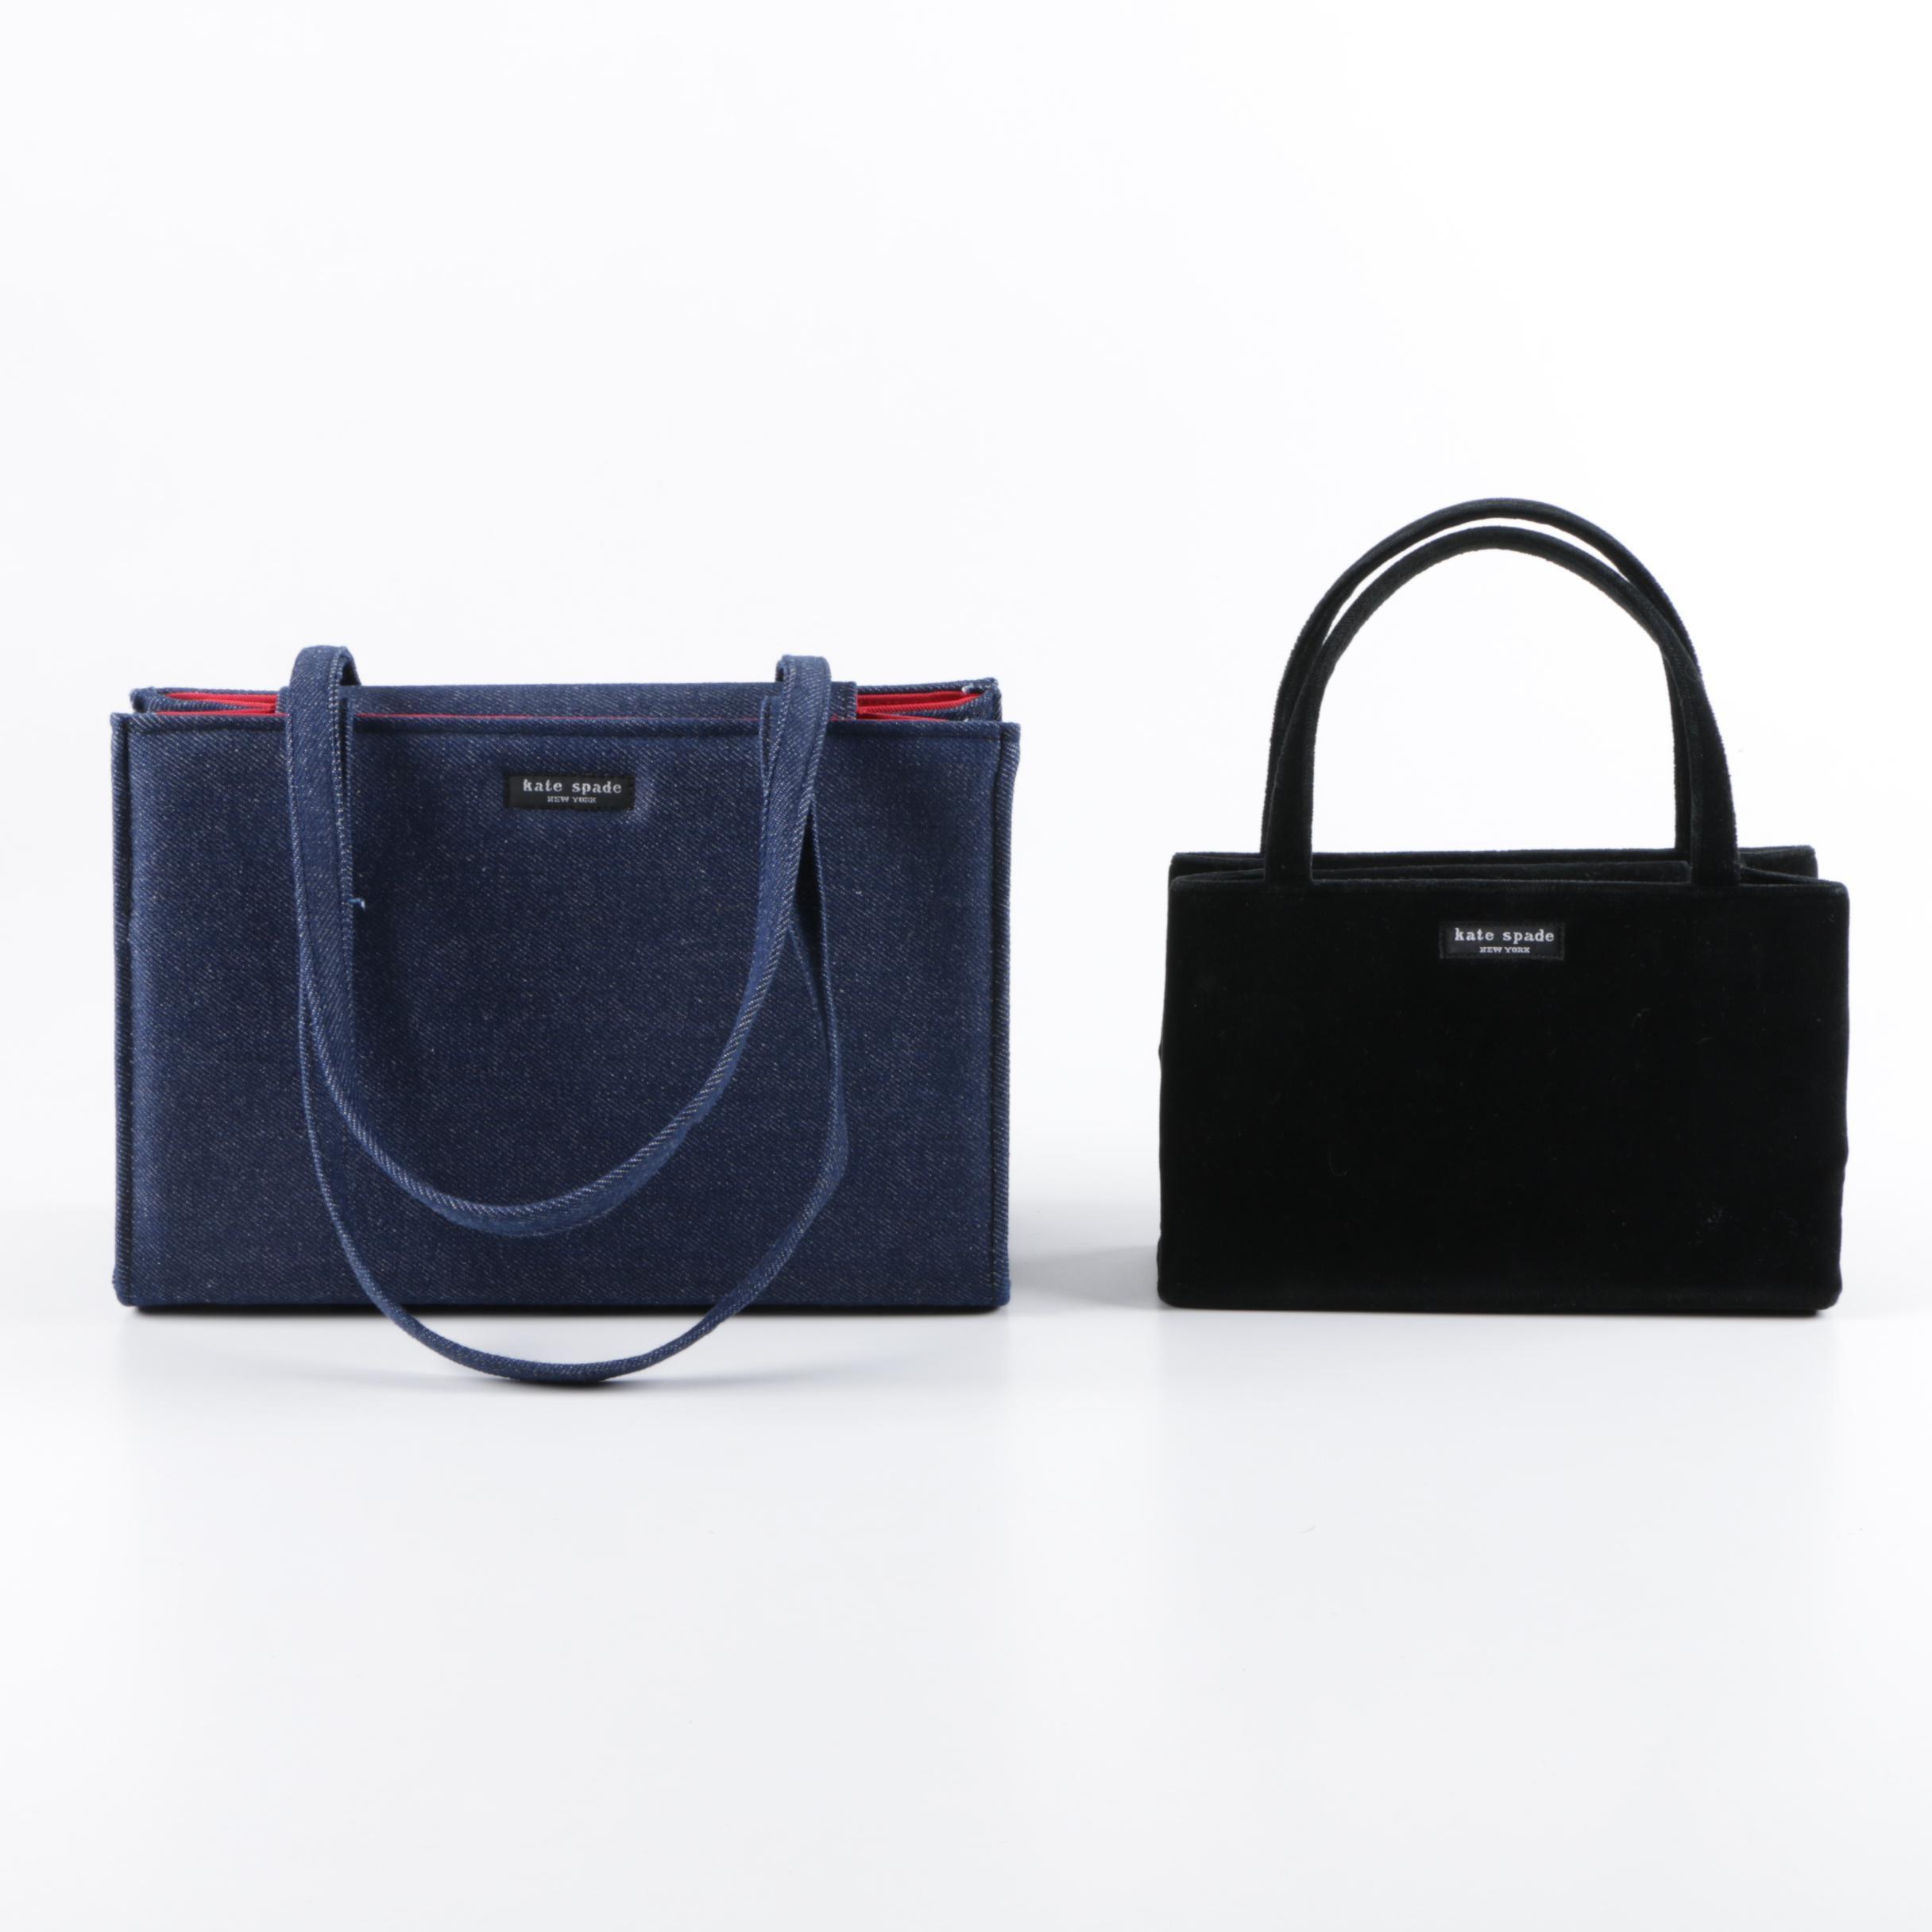 Kate Spade New York Fabric Tote Bags